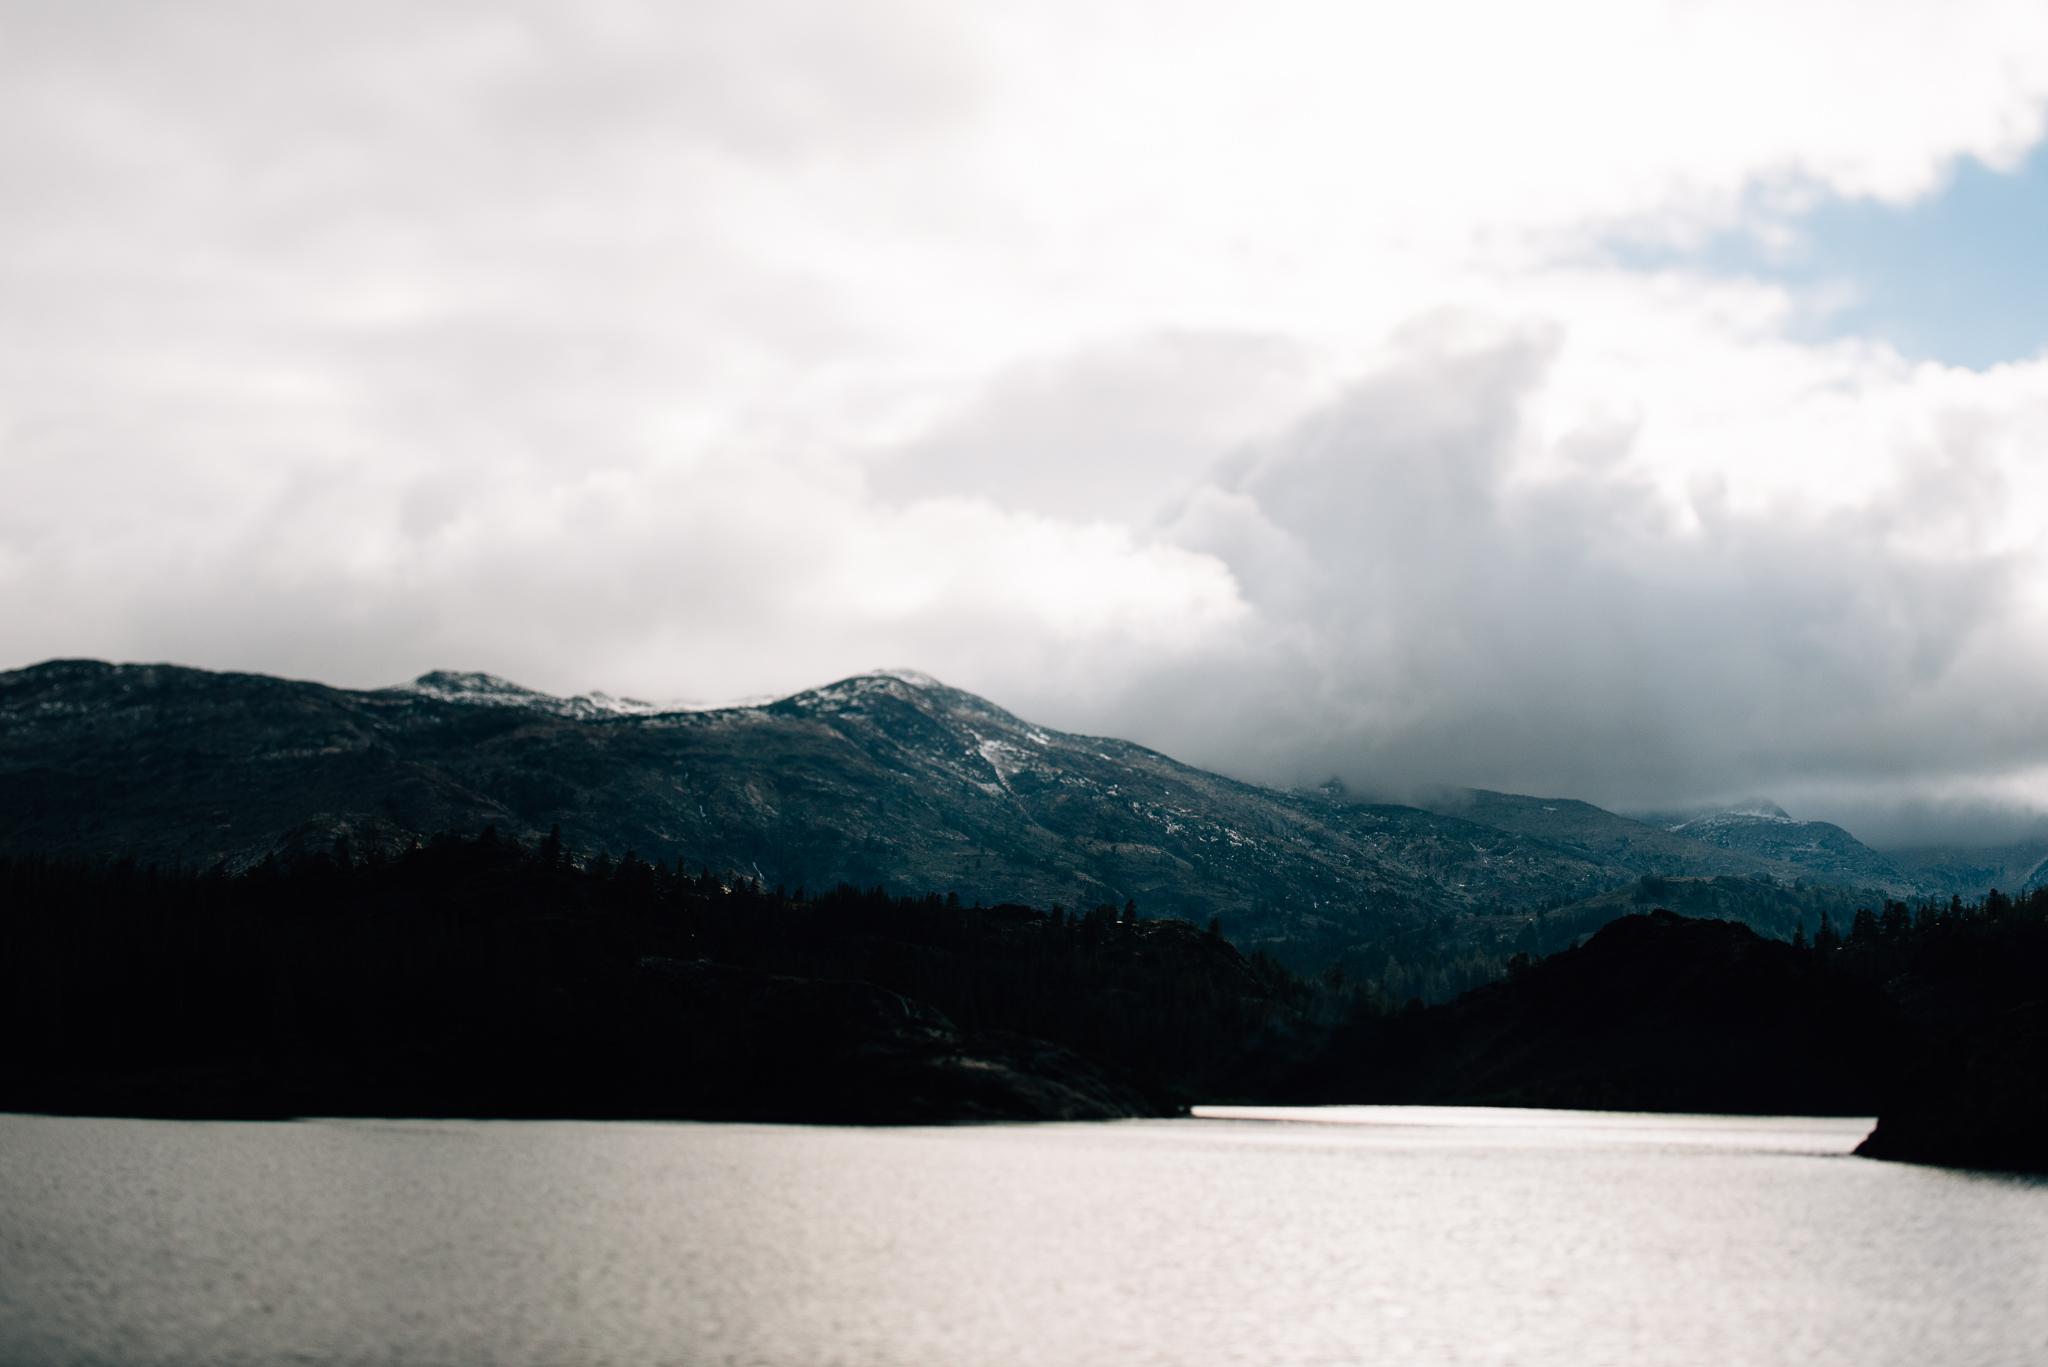 ©The Ryans Photography - Los Angeles Travel - Tuolomne Meadows Yosemite-010.jpg